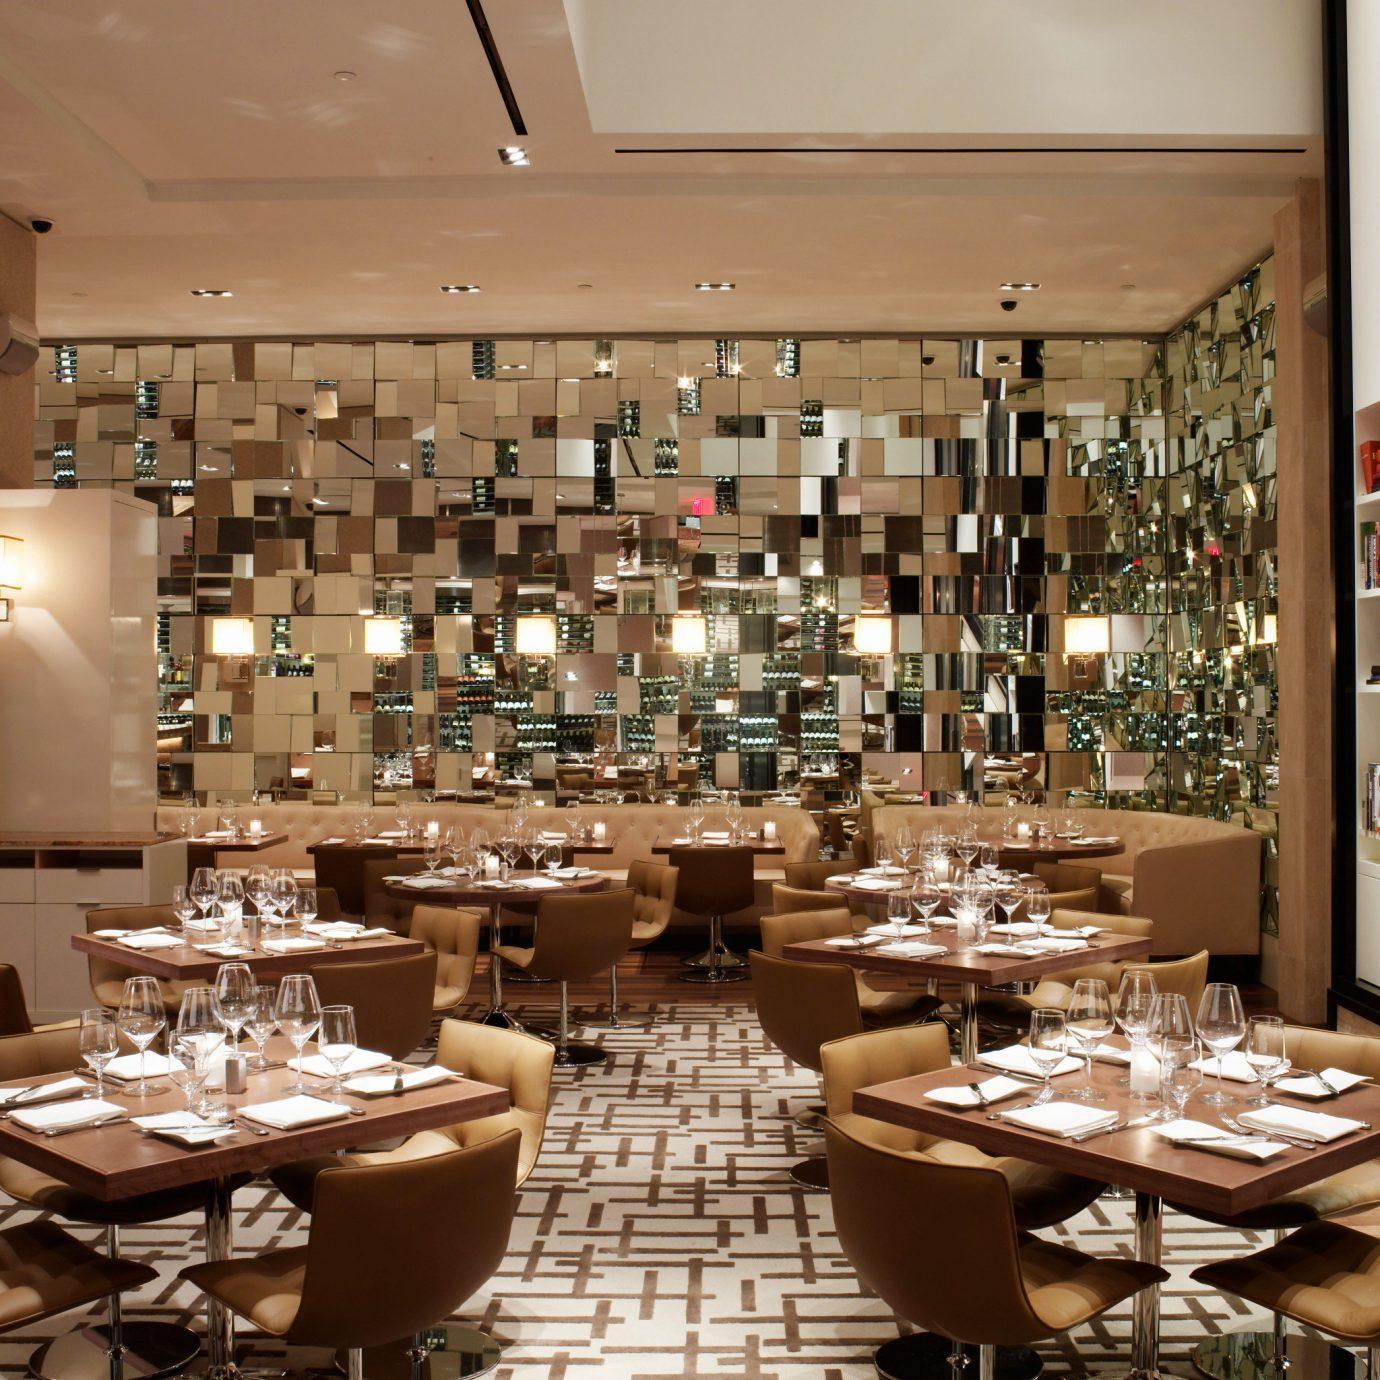 Dining Drink Eat Elegant Modern restaurant function hall café Lobby set